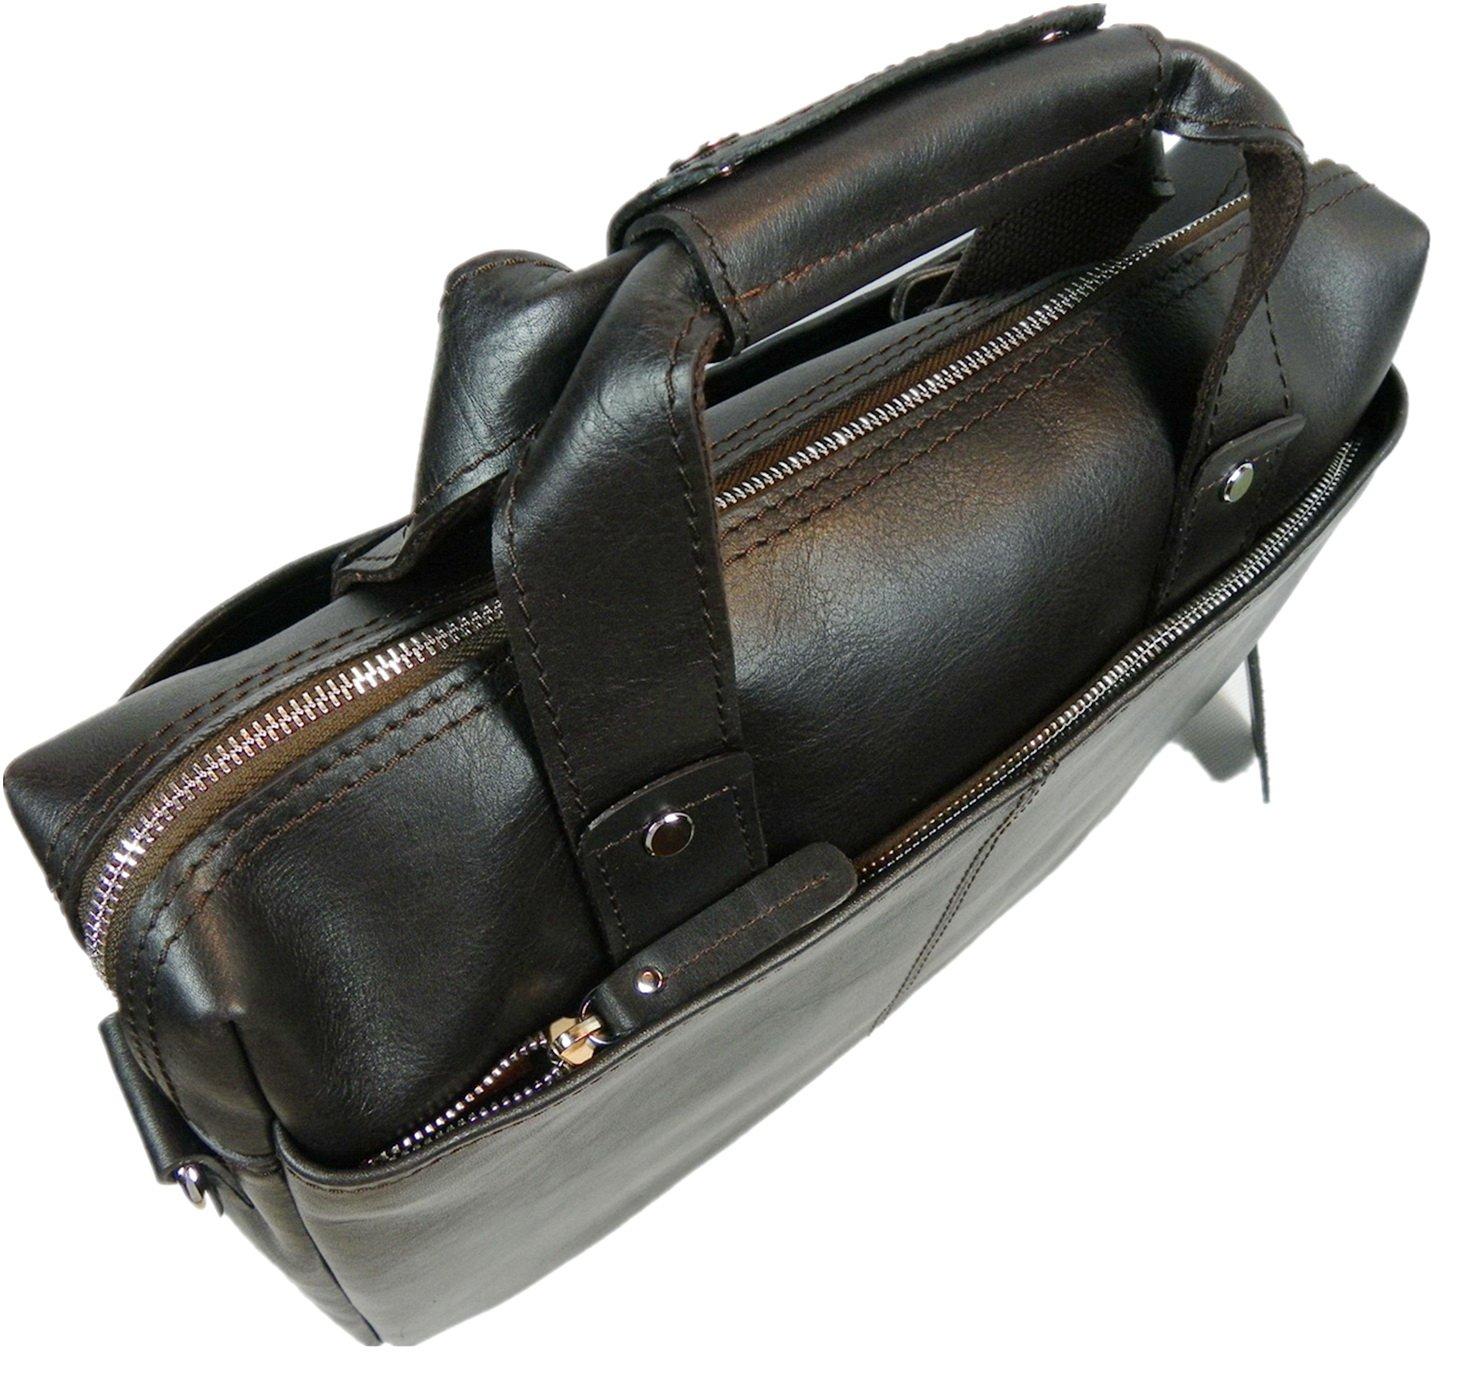 Vagabond Traveler 15'' Classic Fine Leather Messenger Bag Daily Bag L29. Distress by Vagabond Traveler (Image #4)